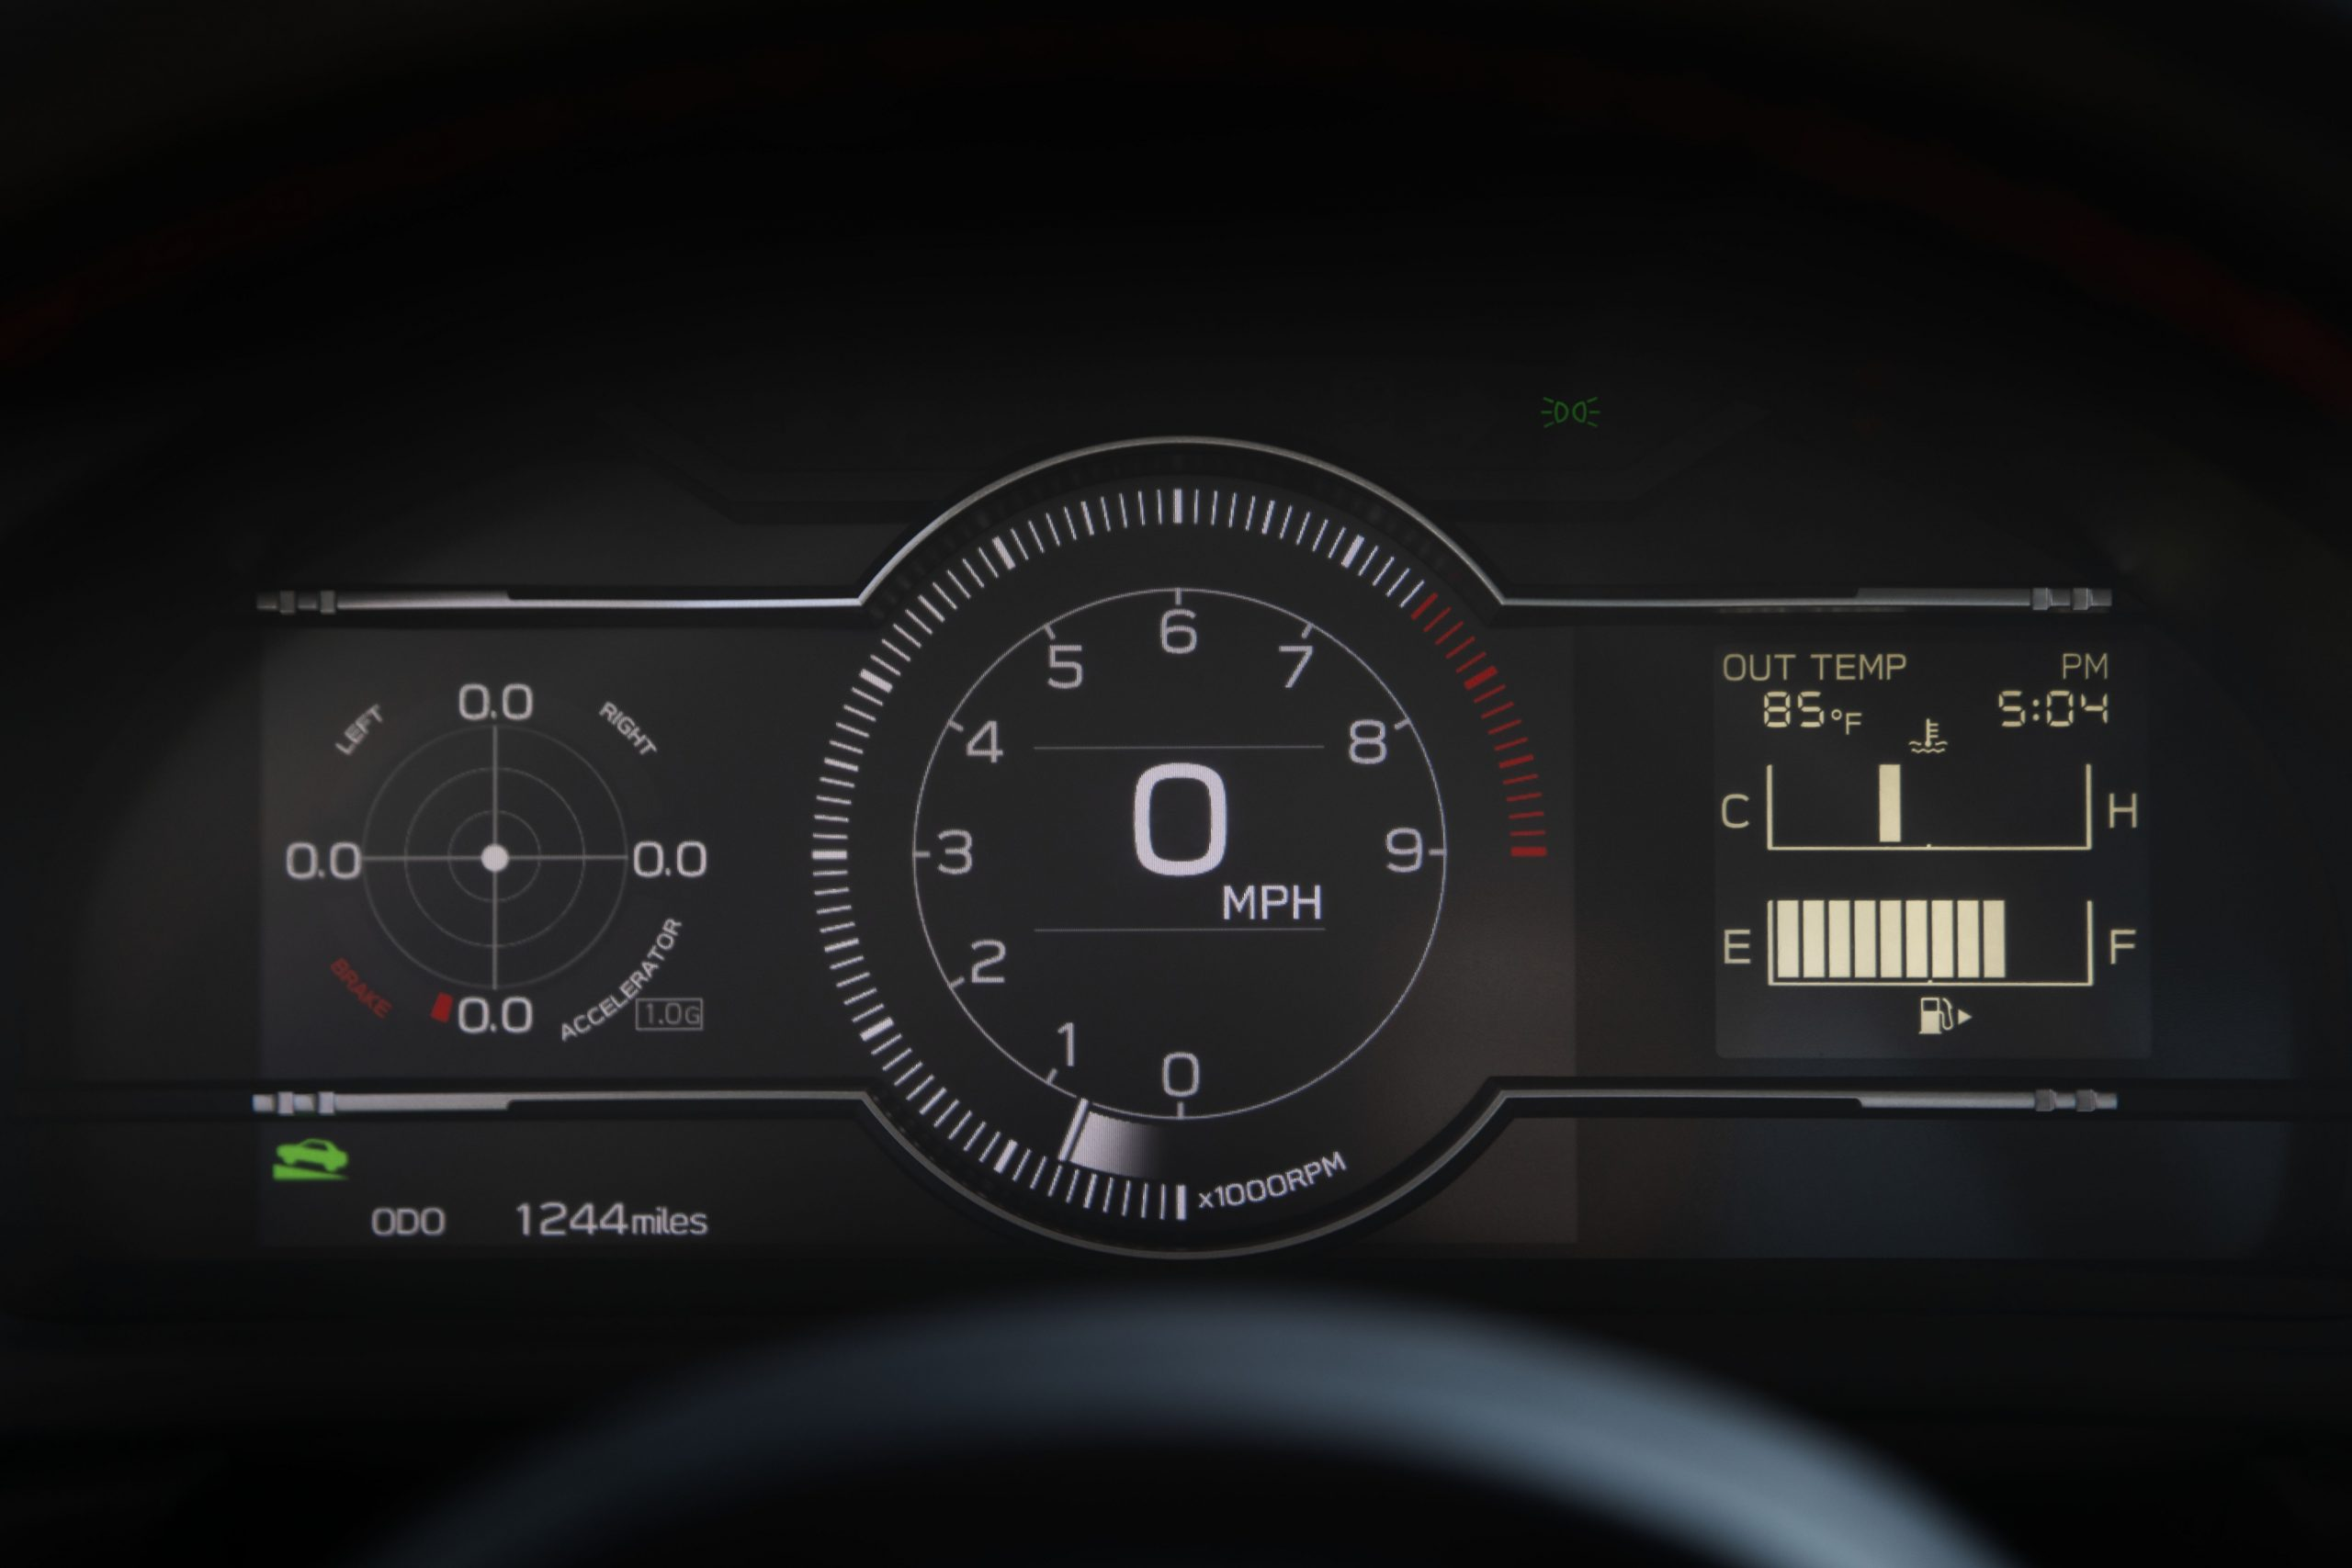 2022 Subaru BRZ interior dash digital gauges